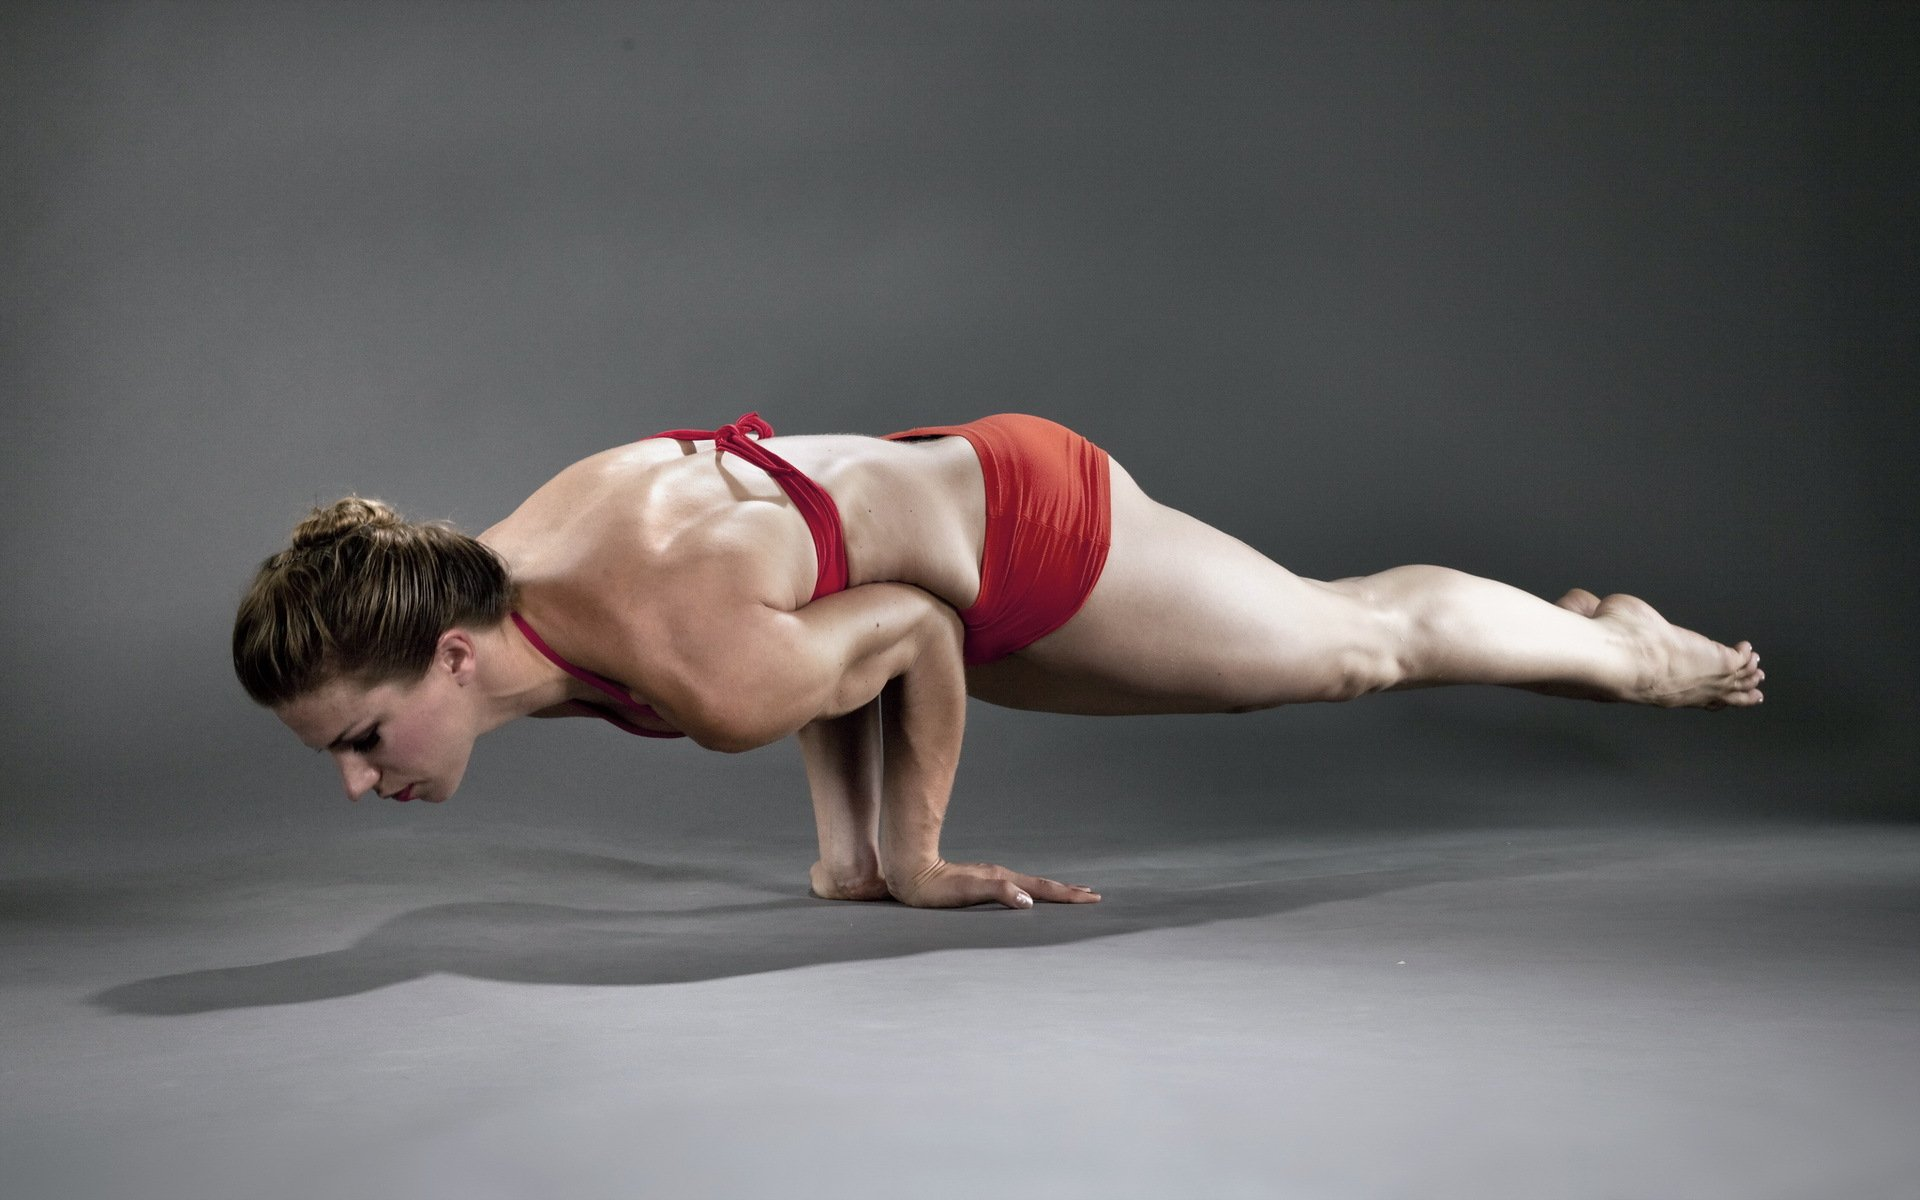 Фото девушки гимнастки 16 фотография